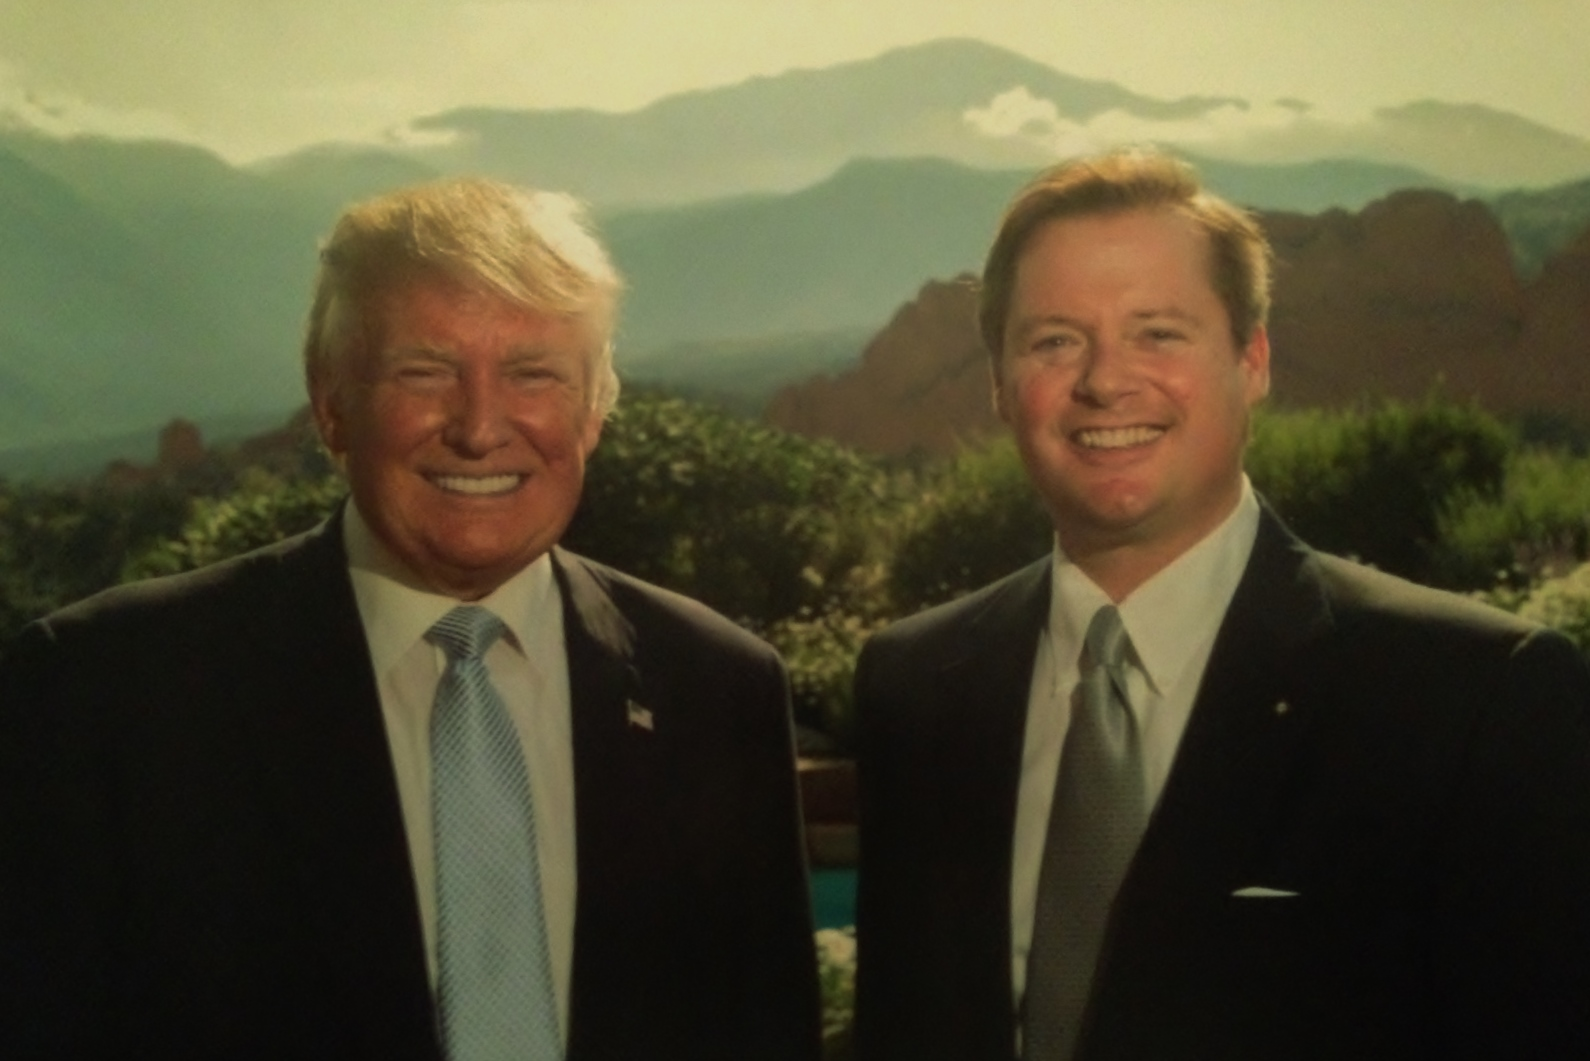 Trump Picks Author of Illuminati Self-Help Books for Commission on Presidential Scholars